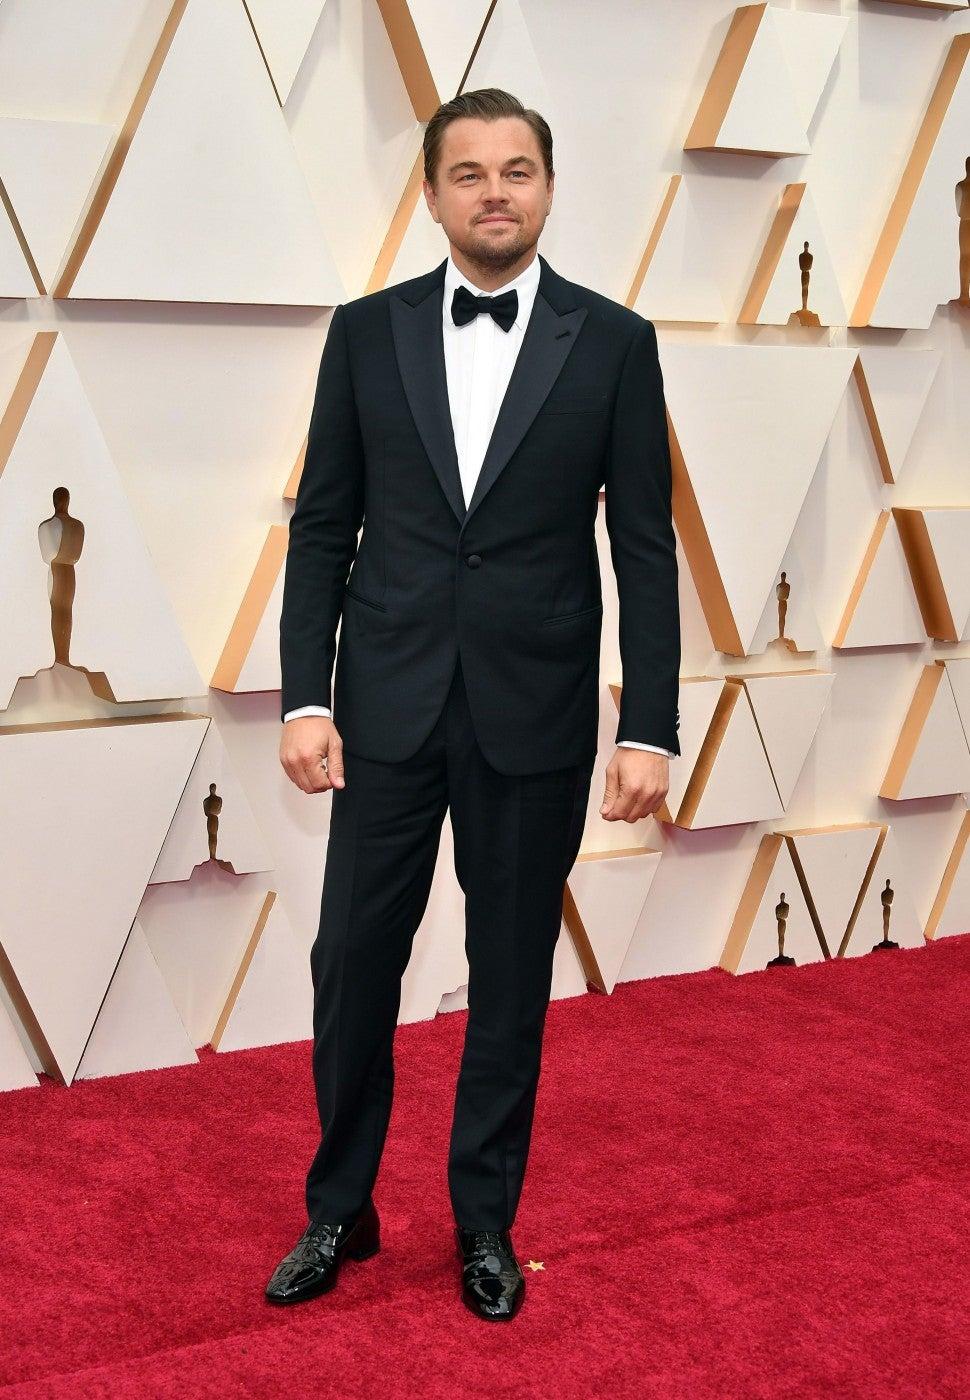 Leonardo DiCaprio at the 92nd Annual Academy Awards